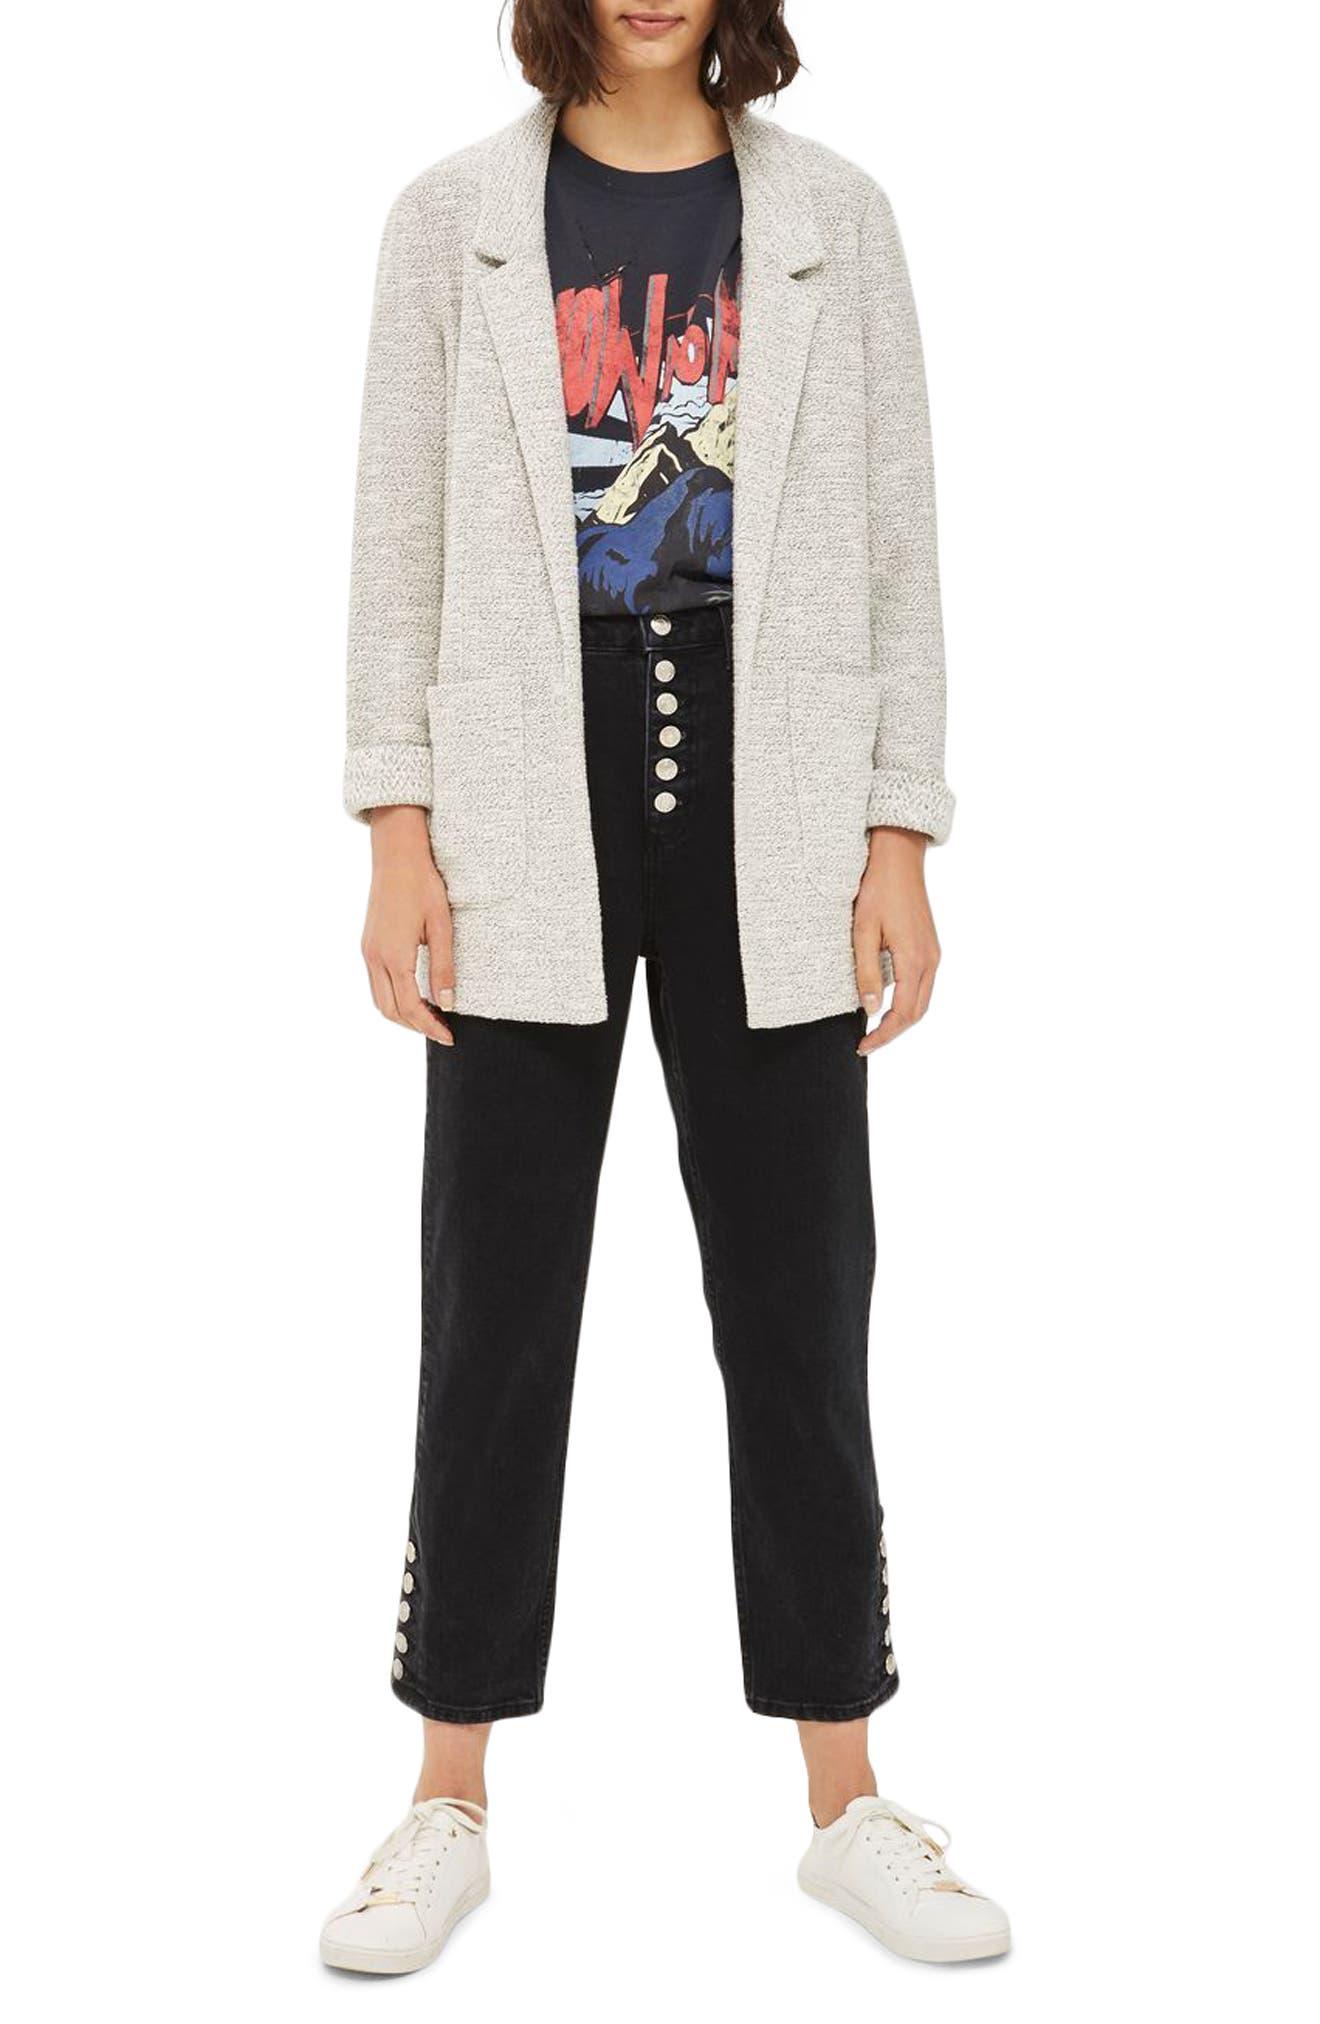 Alternate Image 1 Selected - Topshop Textured Jersey Blazer